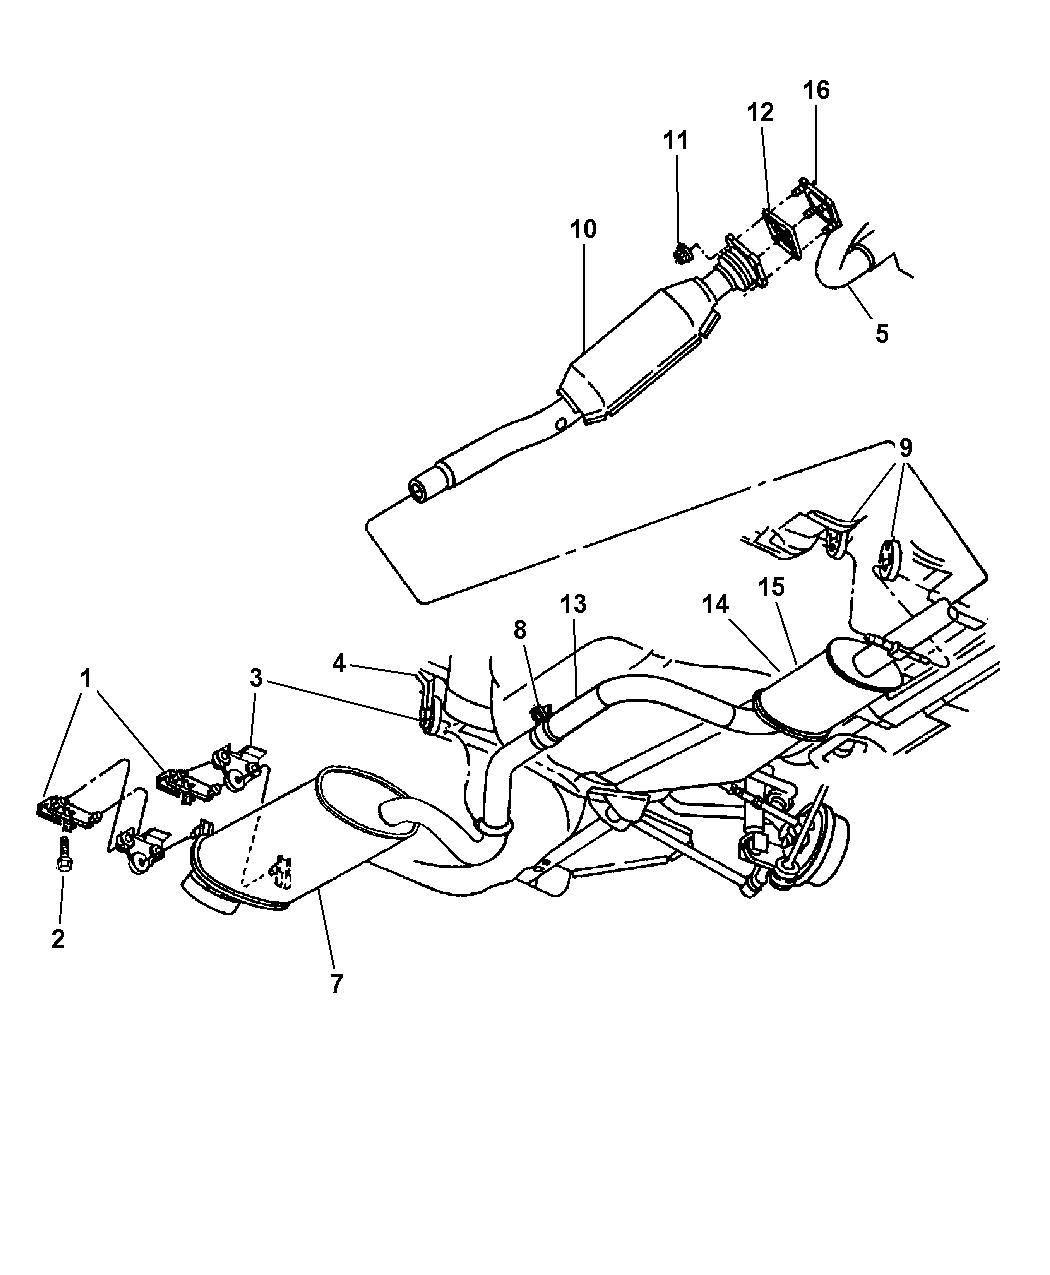 md041236